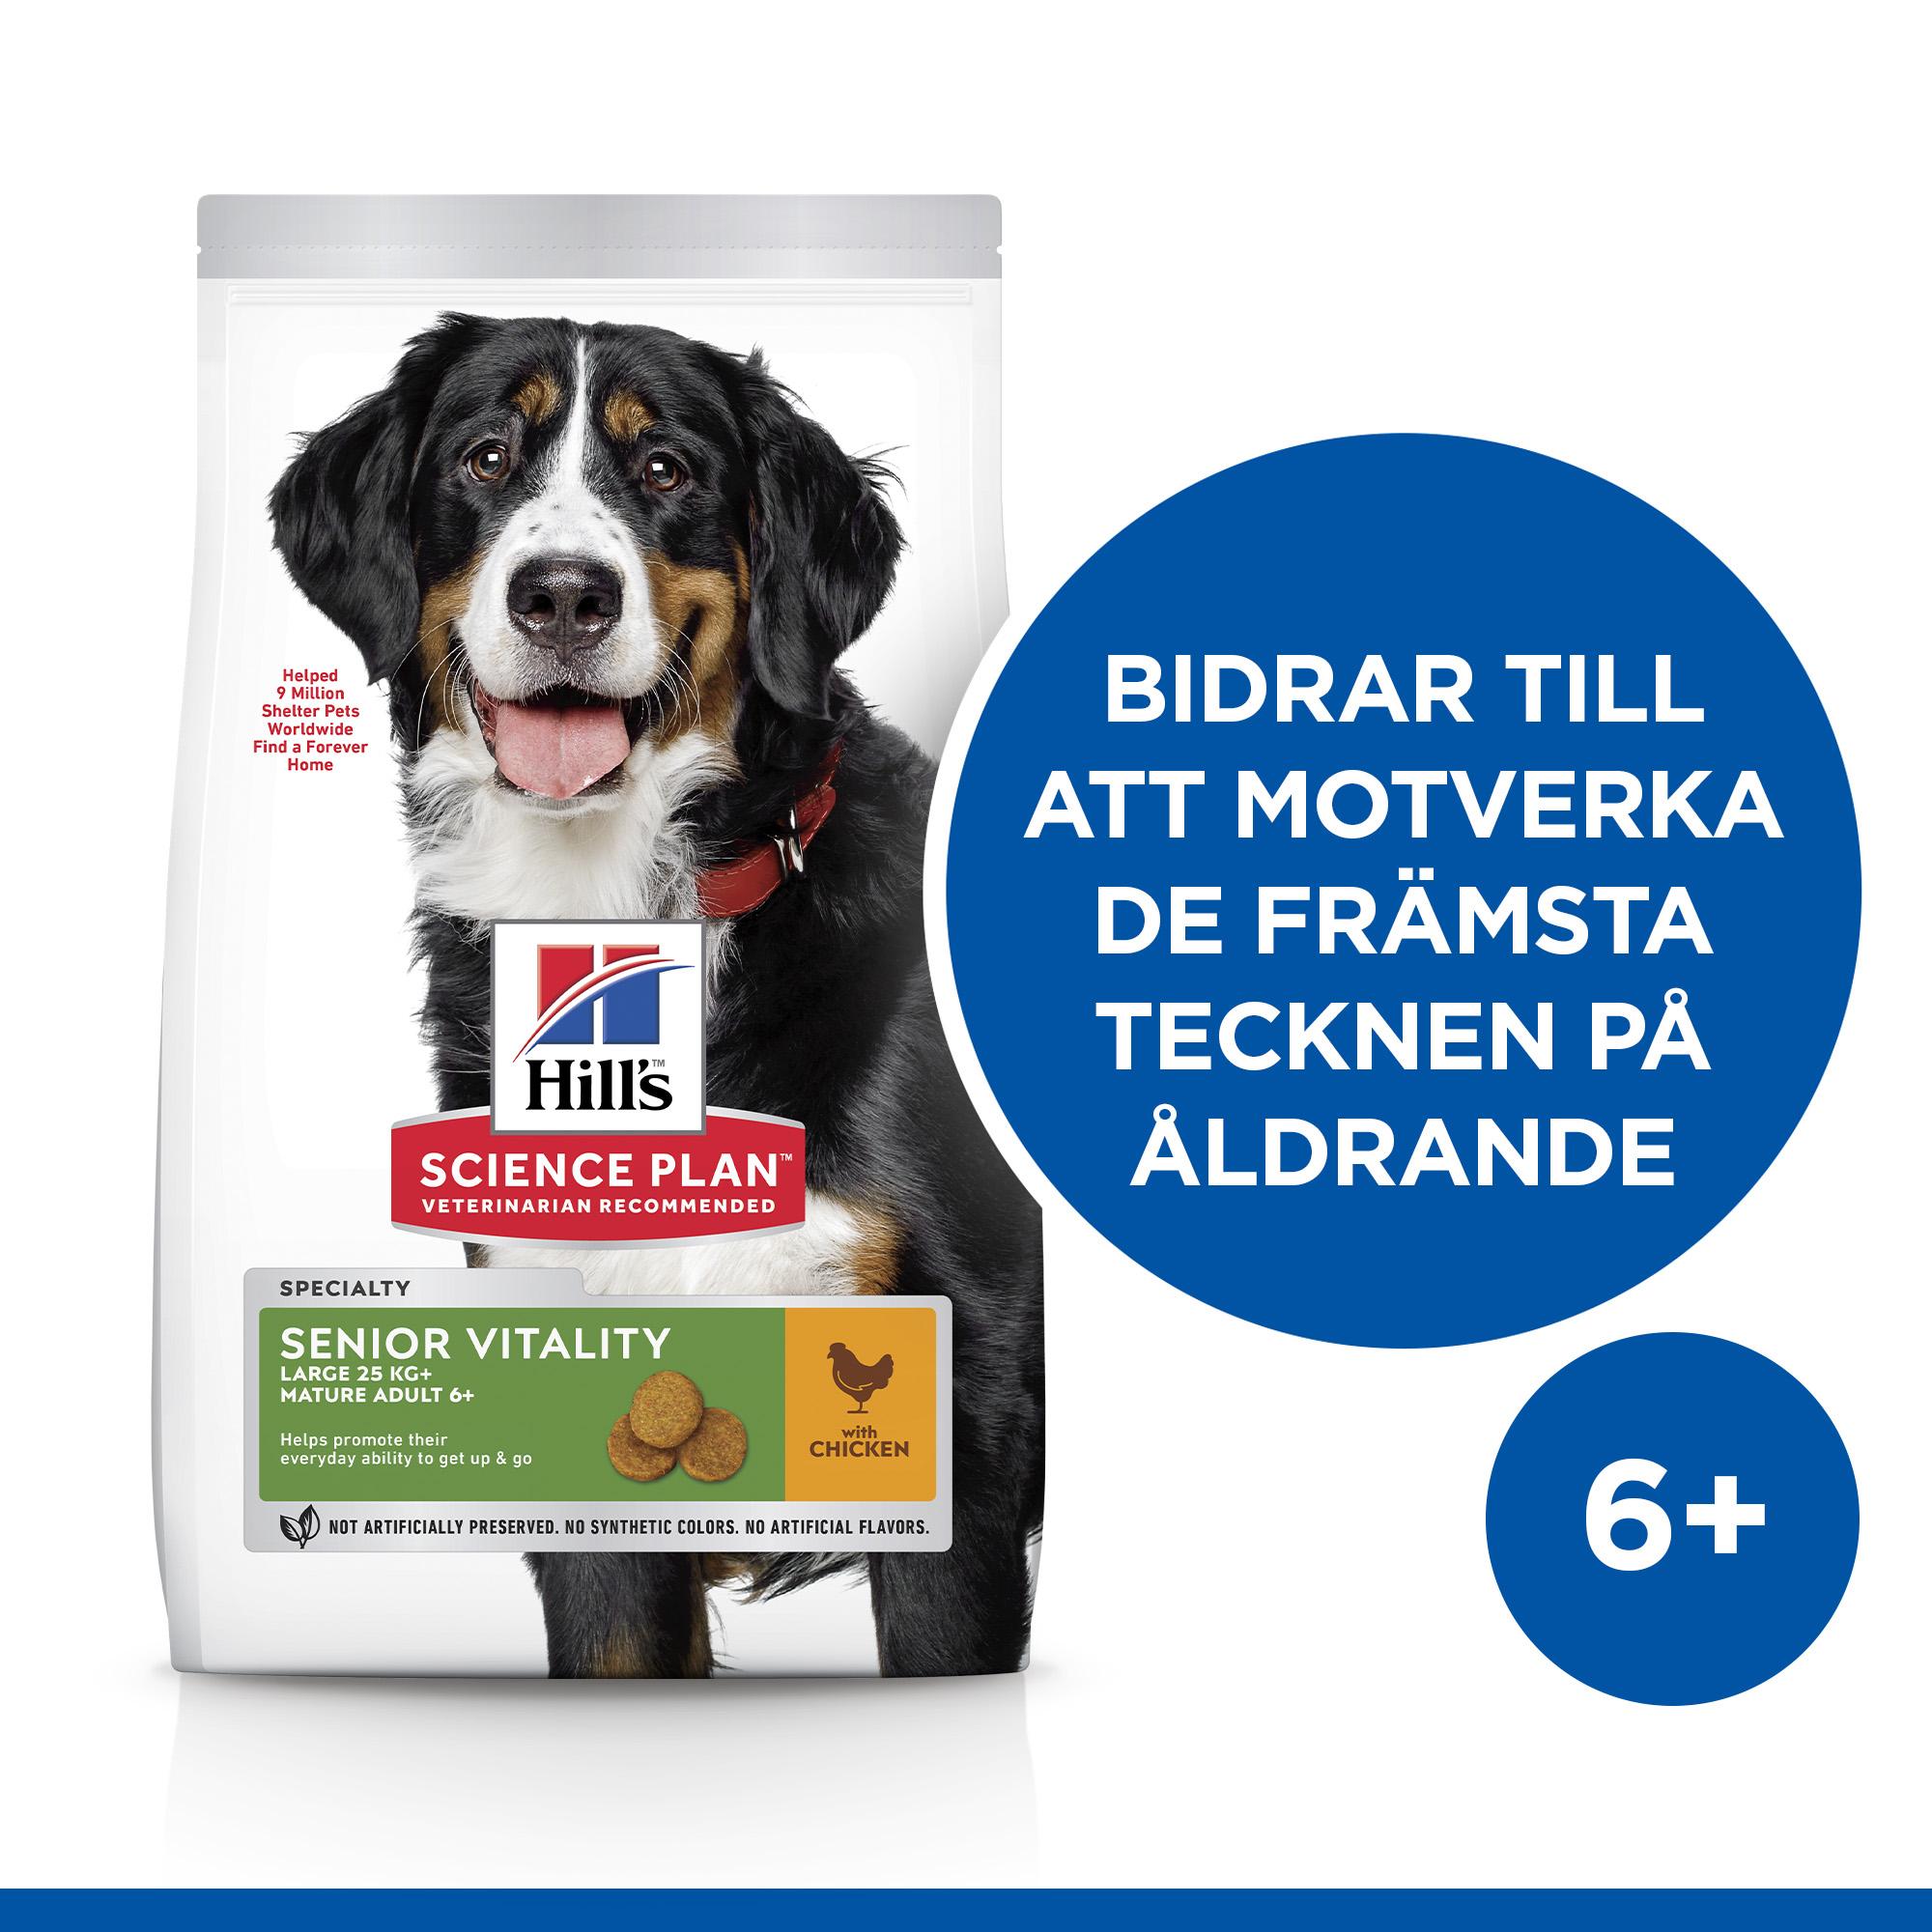 Senior Vitality Large Breed Mature Adult 6+ hundfoder med kyckling & ris